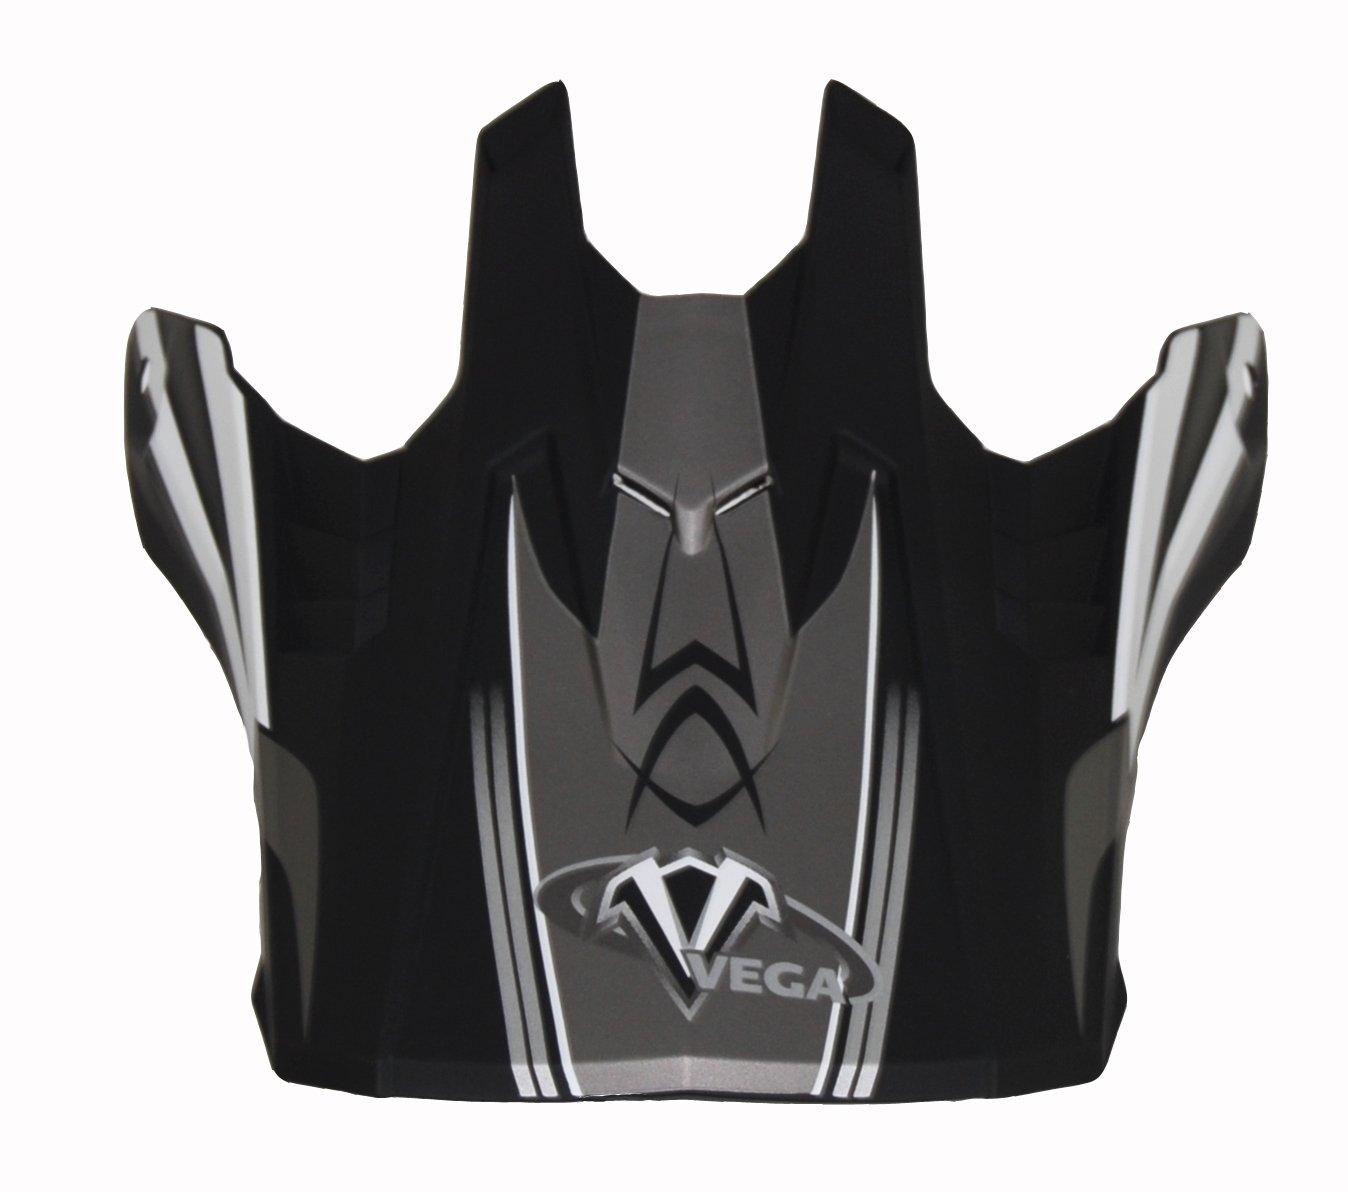 92-392501 Vega Off-Road Helmet Visor with NBX-Pro Sidewinder Graphic Black, Size Adult